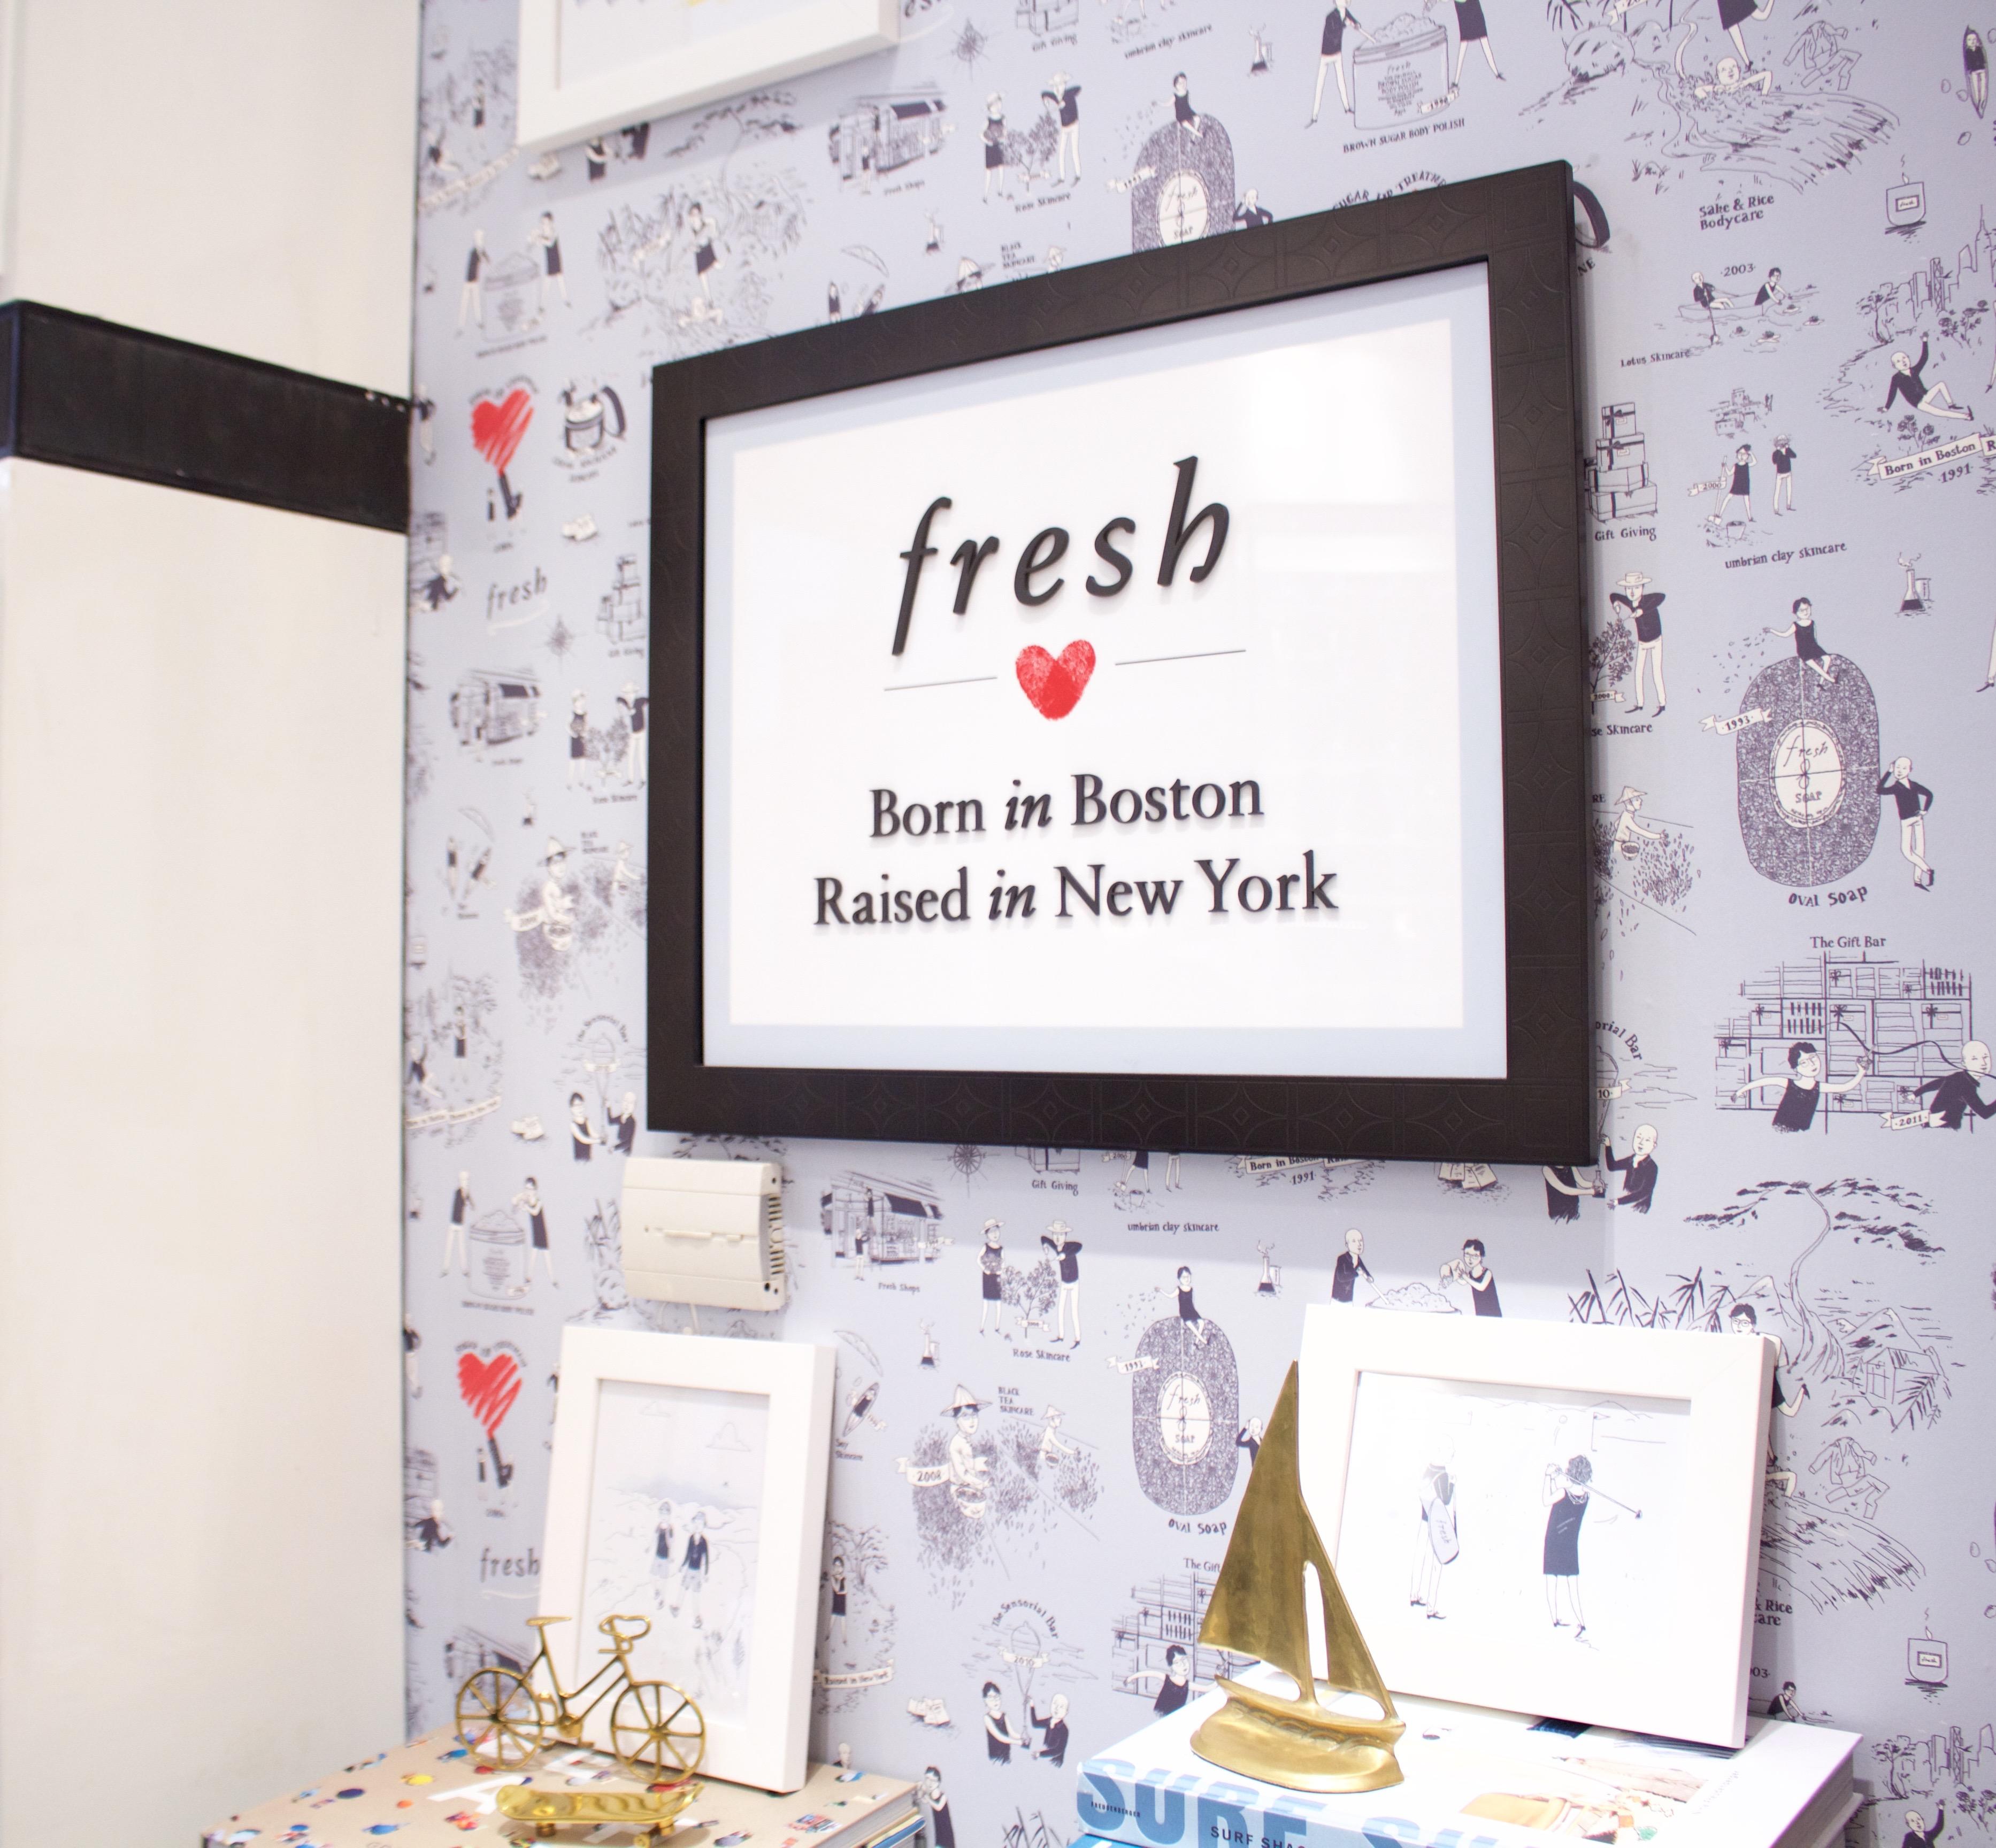 new Fresh store South Coast Plaza